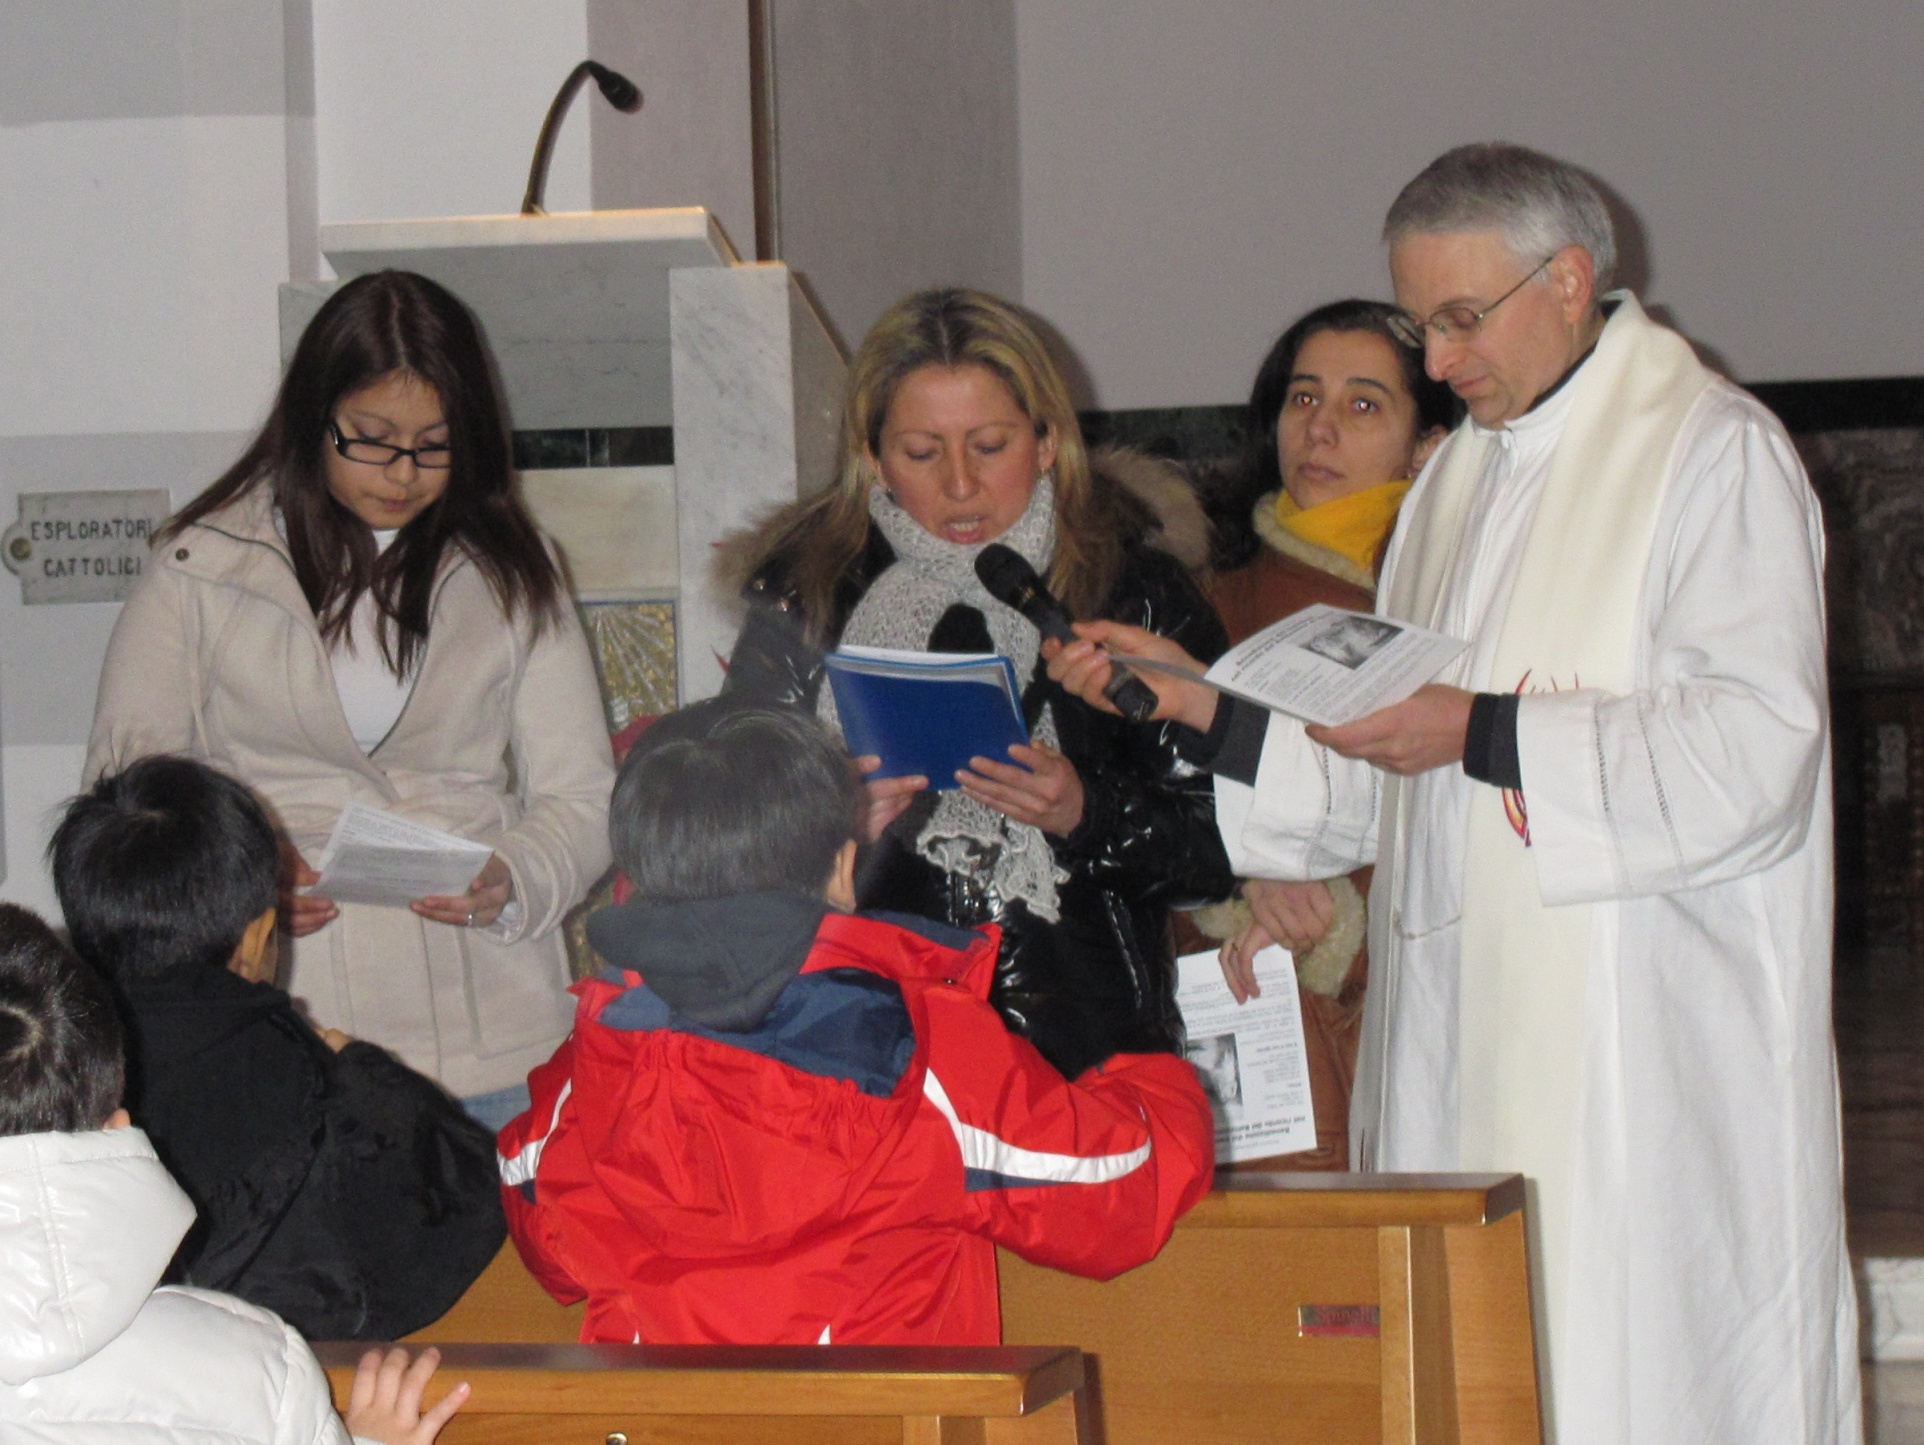 ricordo_battesimo_gesu_2011-01-23-16-26-24